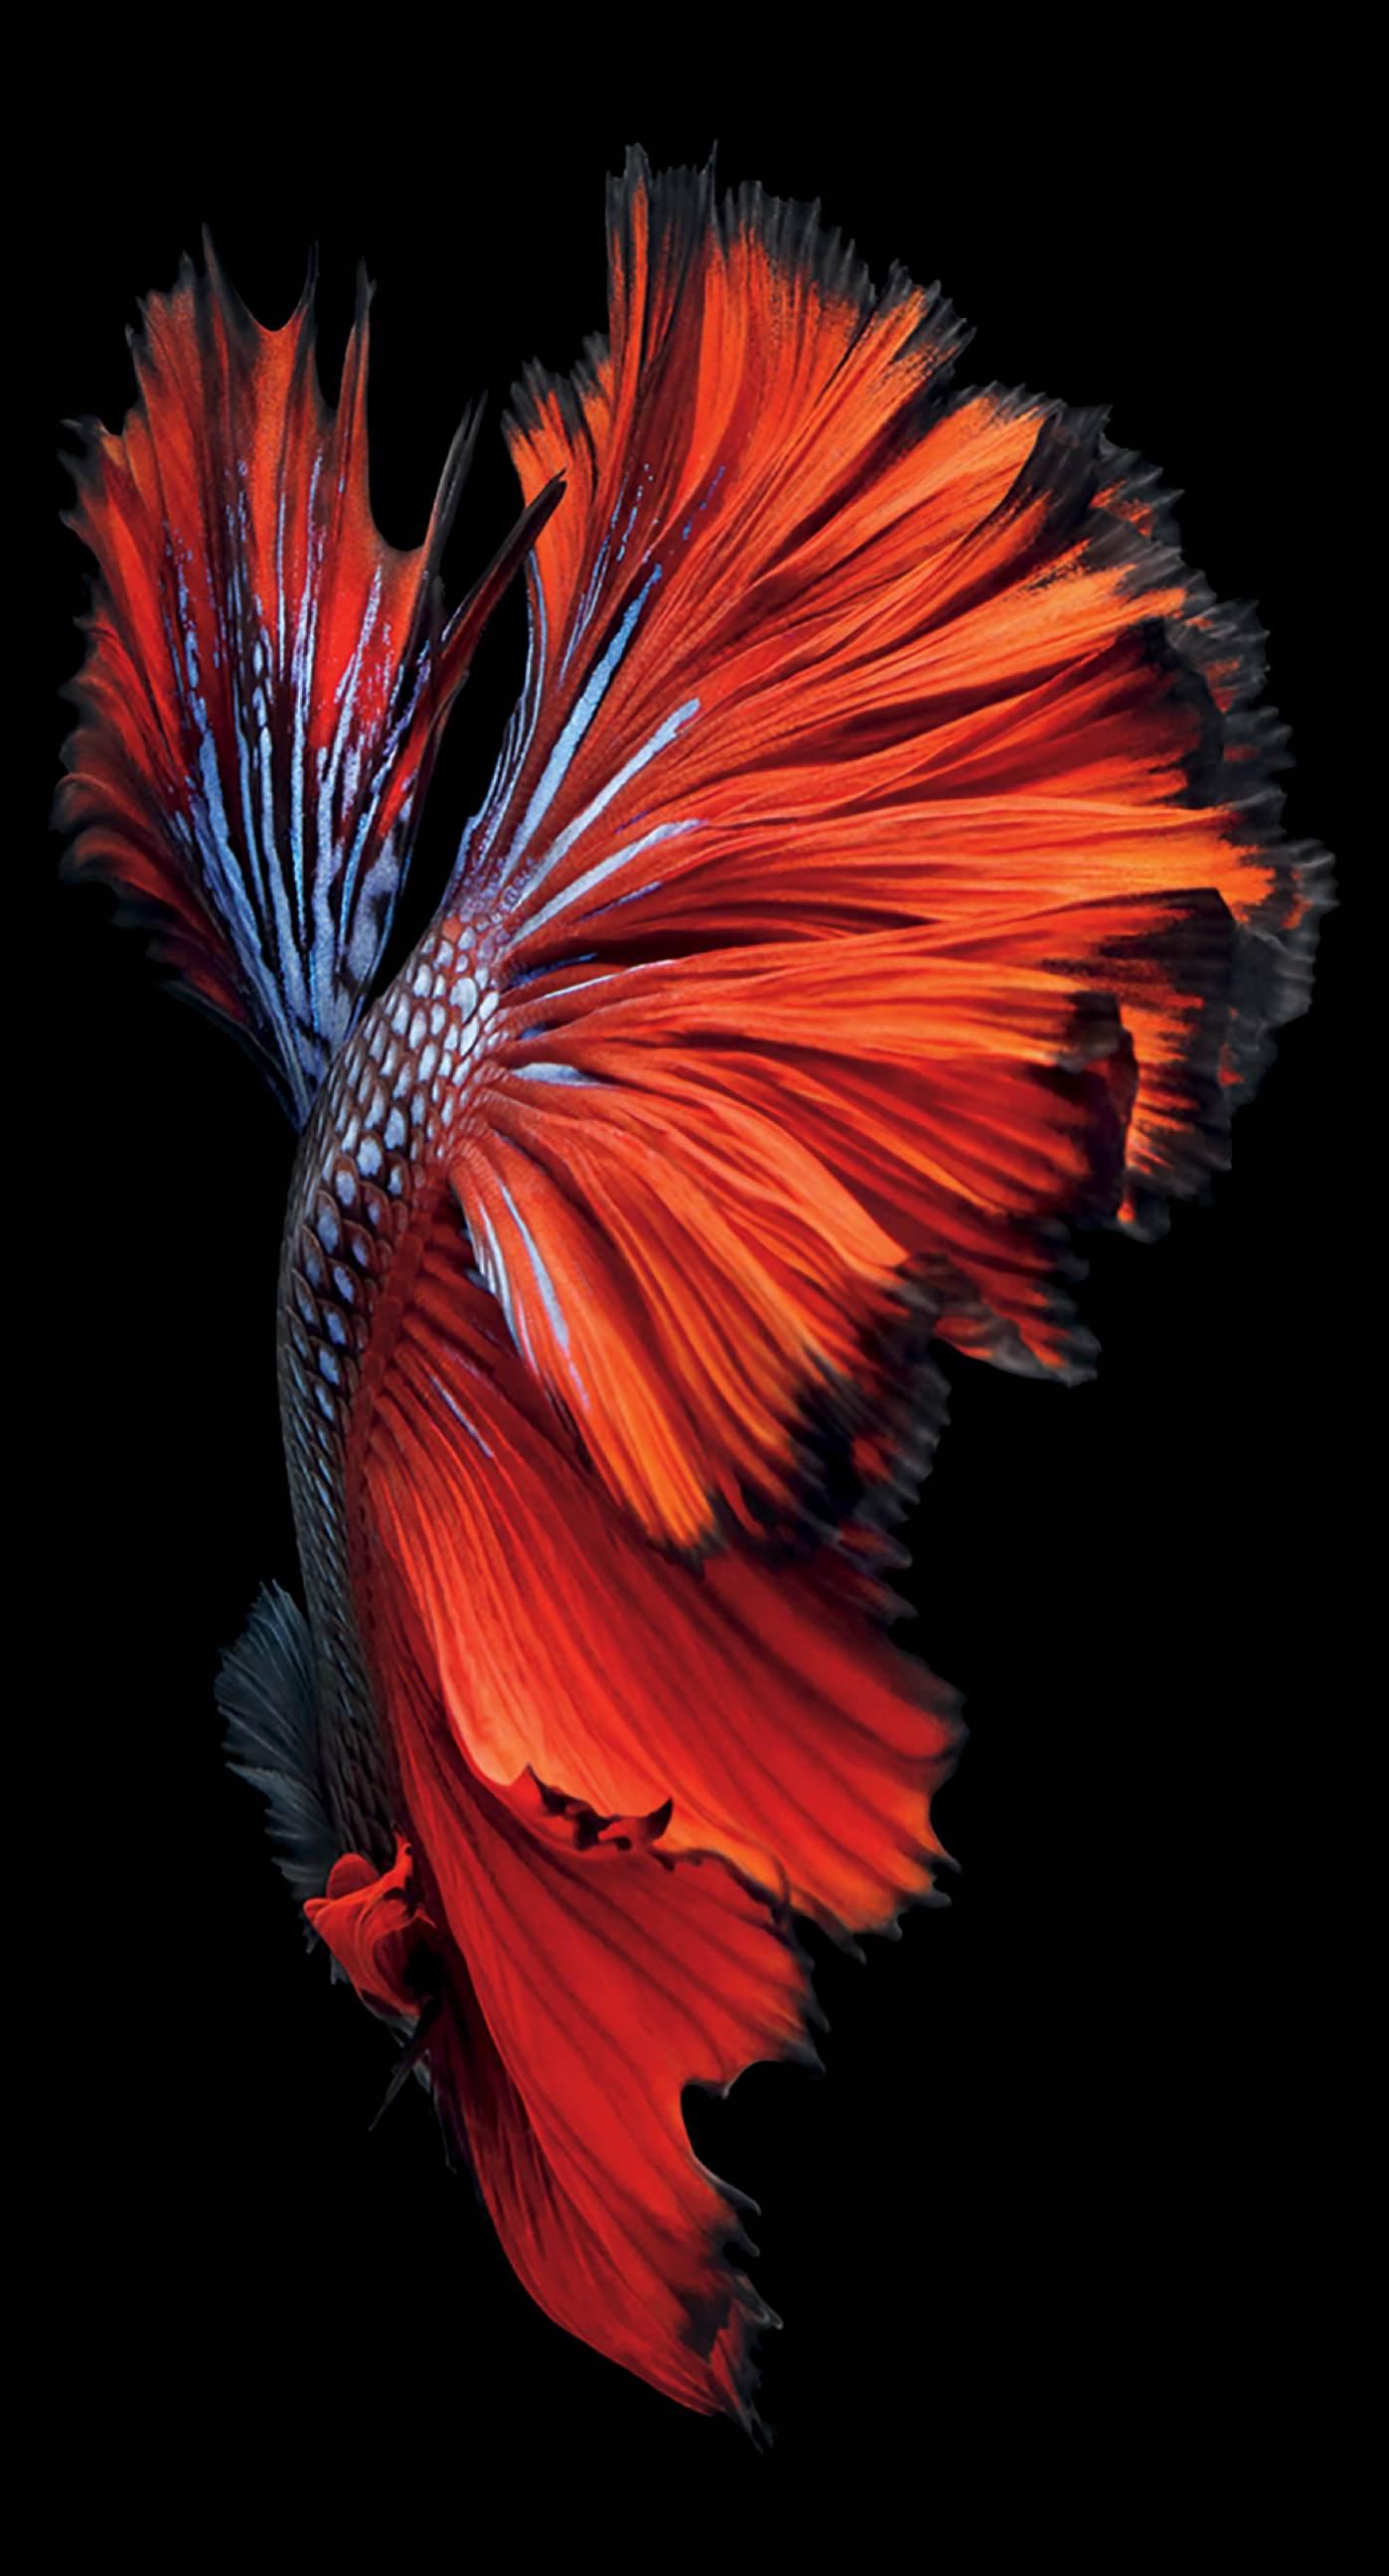 b4283d496a5 Black Red Fish iPhone6sPlus Cool | wallpaper.sc iPhone6sPlus